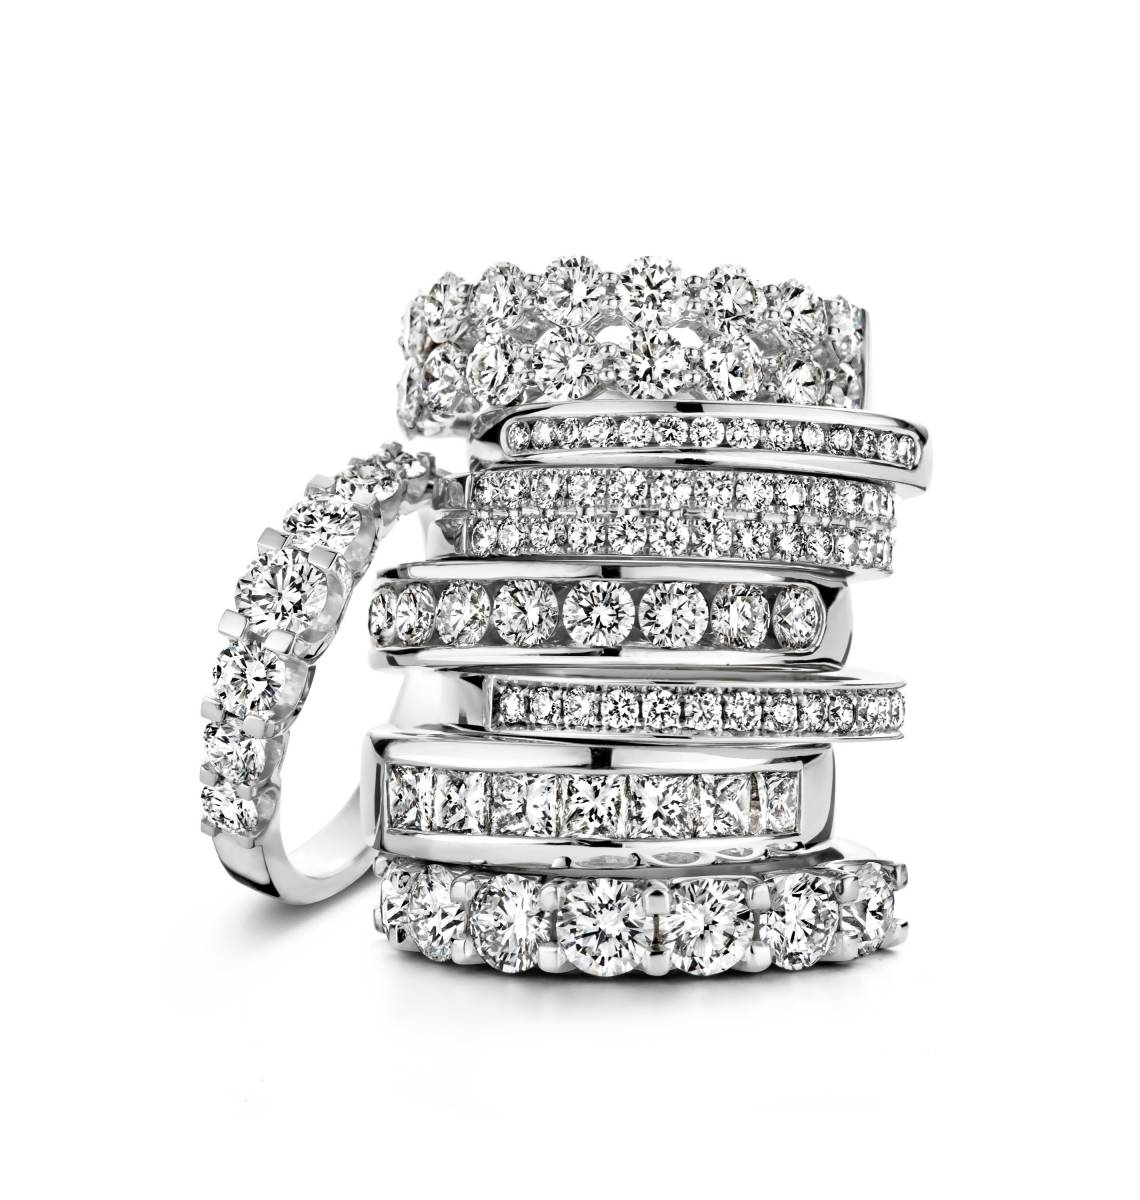 Juwelier Martens - Verlovingsringen - Trouwringen - Juwelen huwelijk - House of Weddings - 11